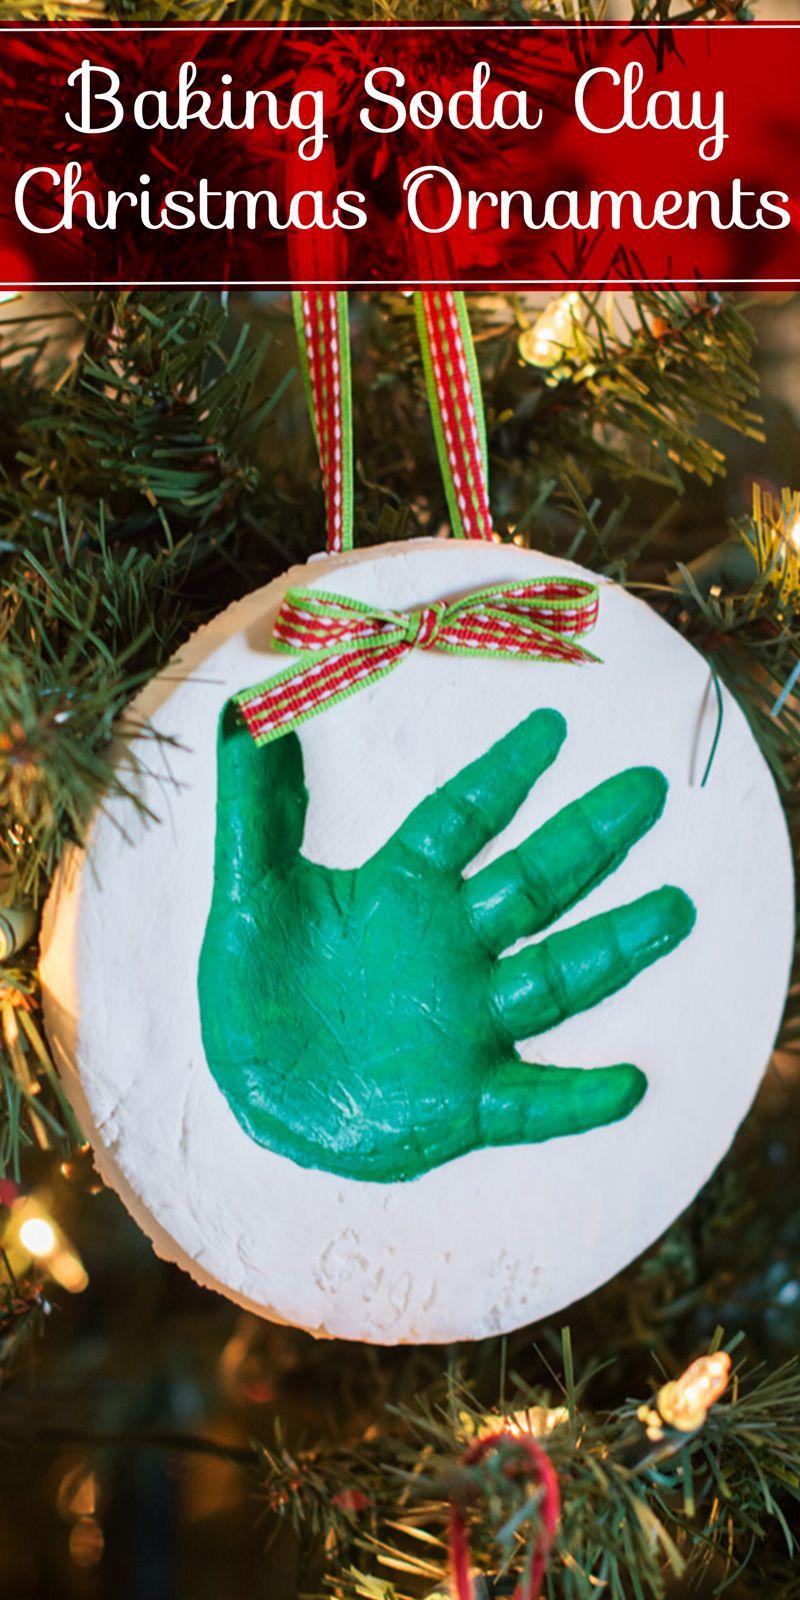 Diy Baking Soda Clay Ornaments Posh In Progress Ornaments Diy Kids Baking Soda Clay Christmas Ornaments